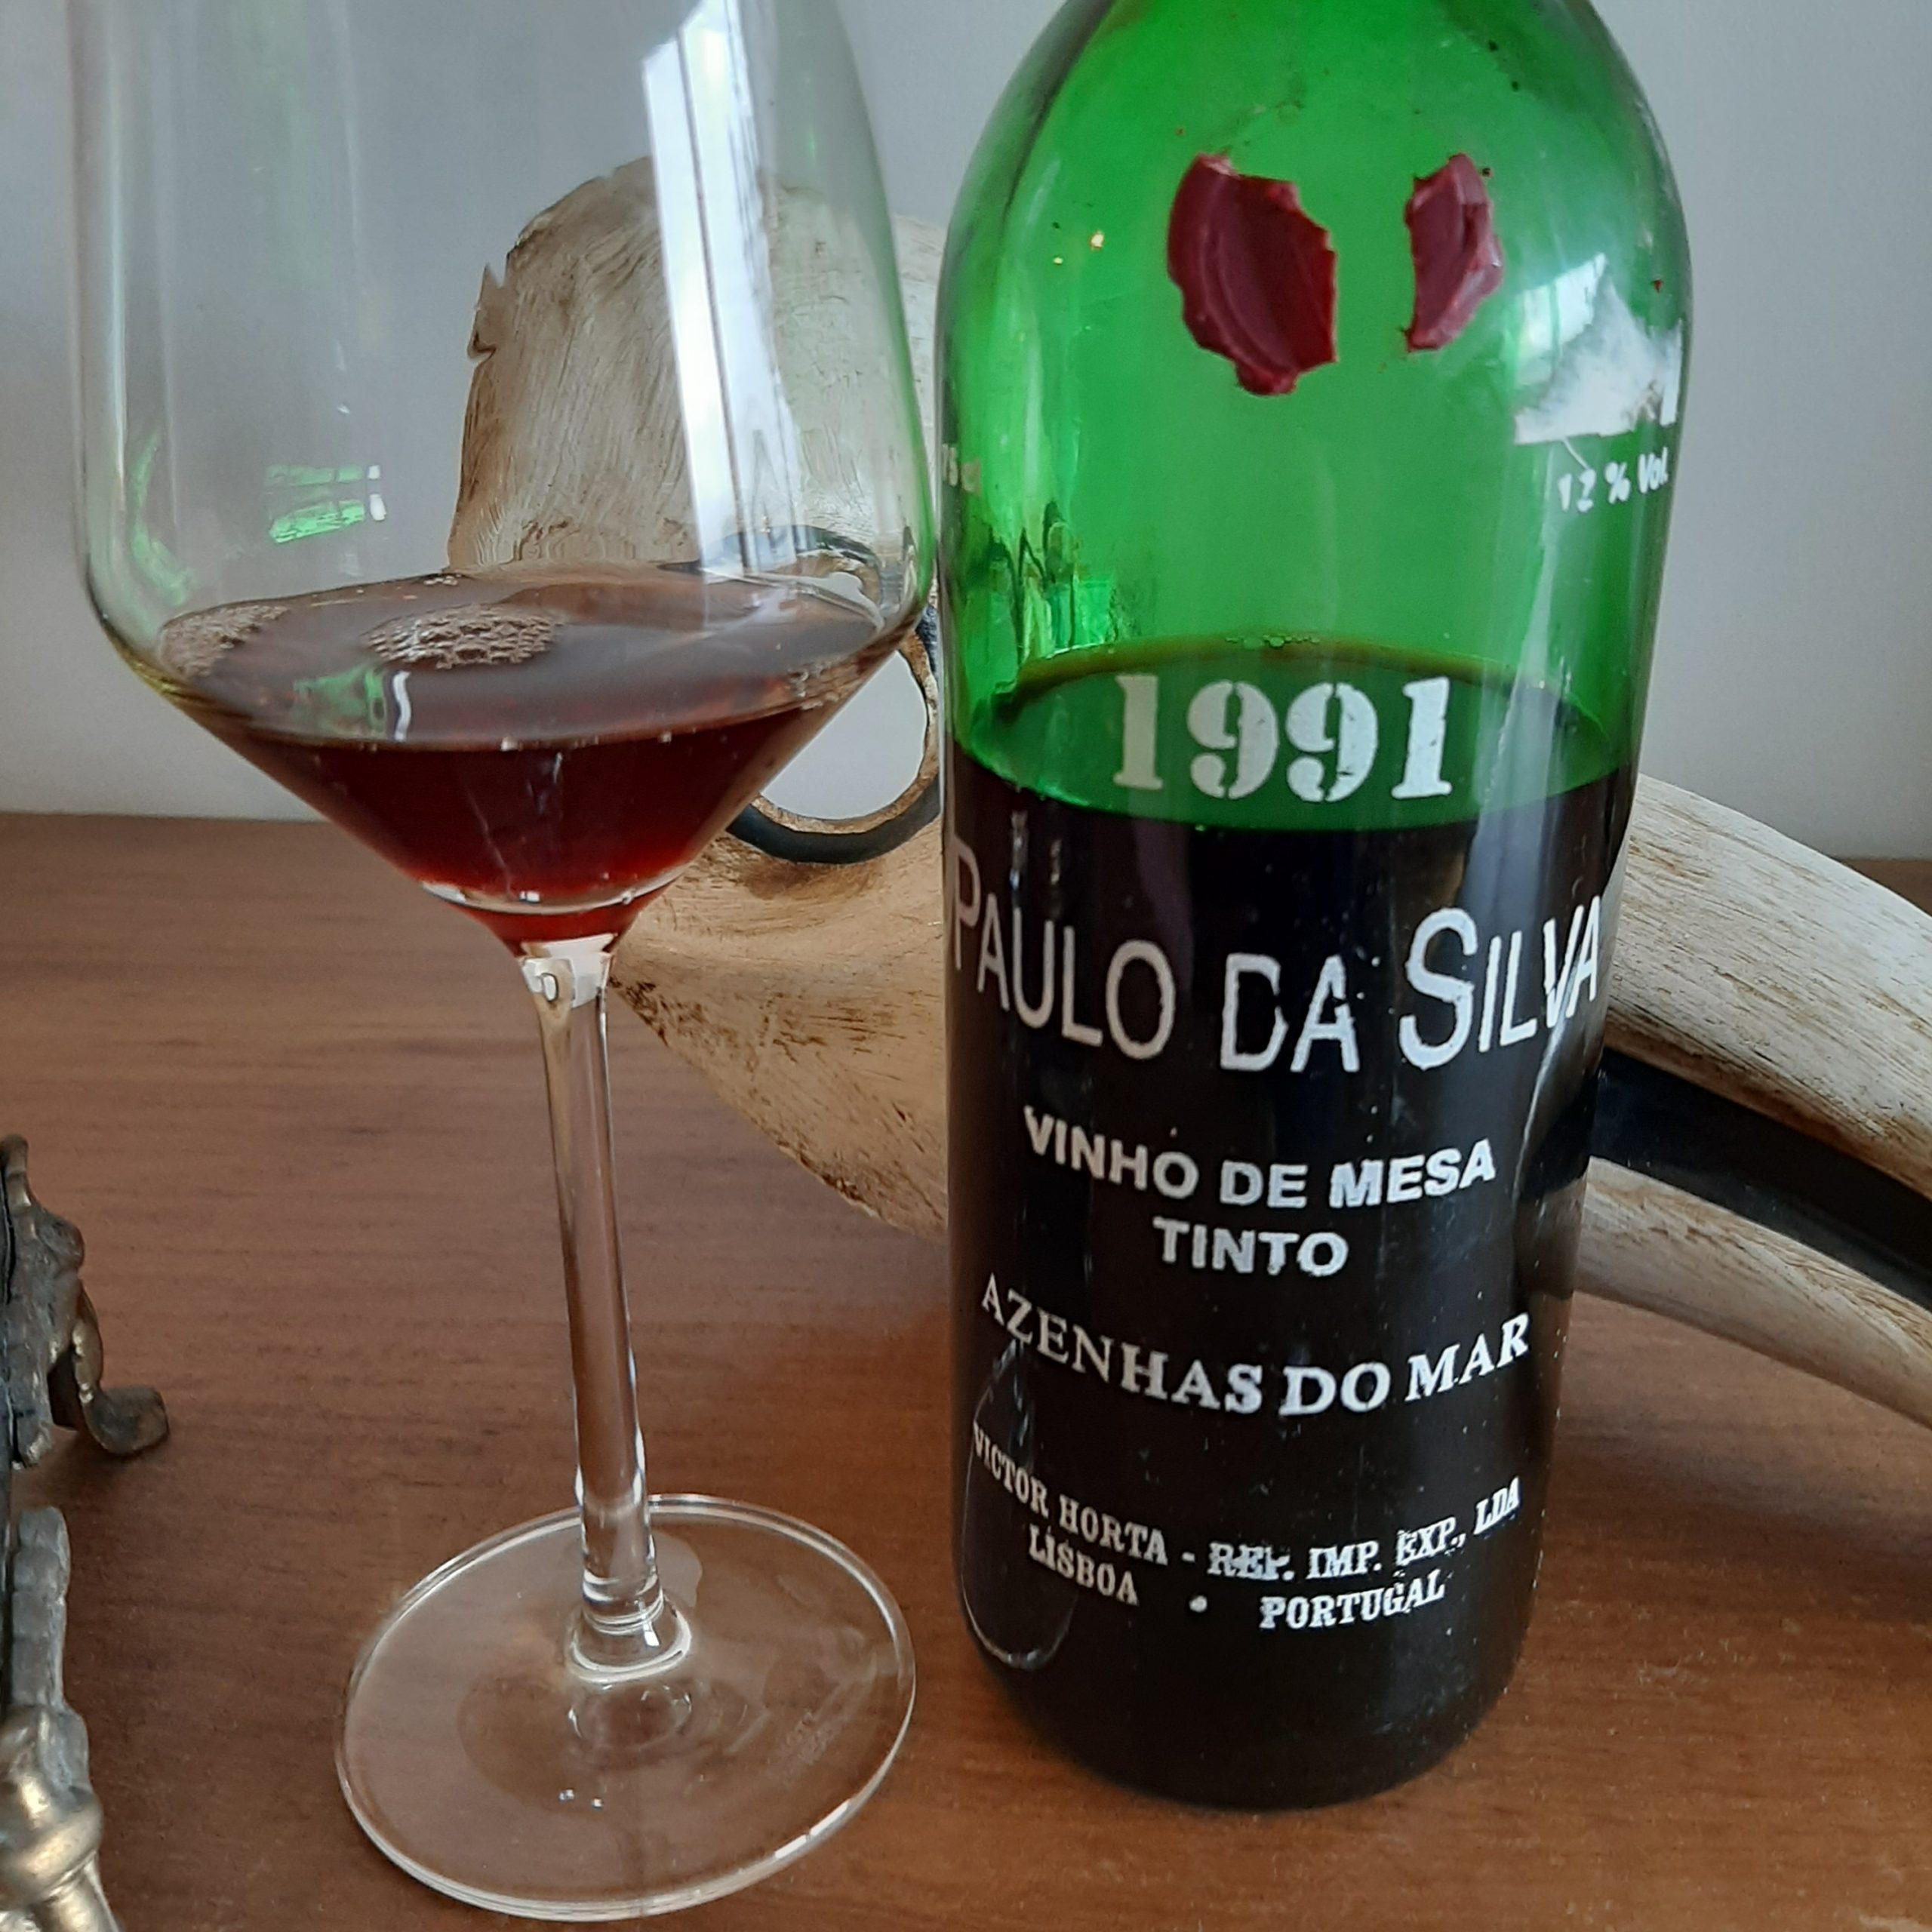 Paulo da Silva tinto 1991, Azenhas do Mar